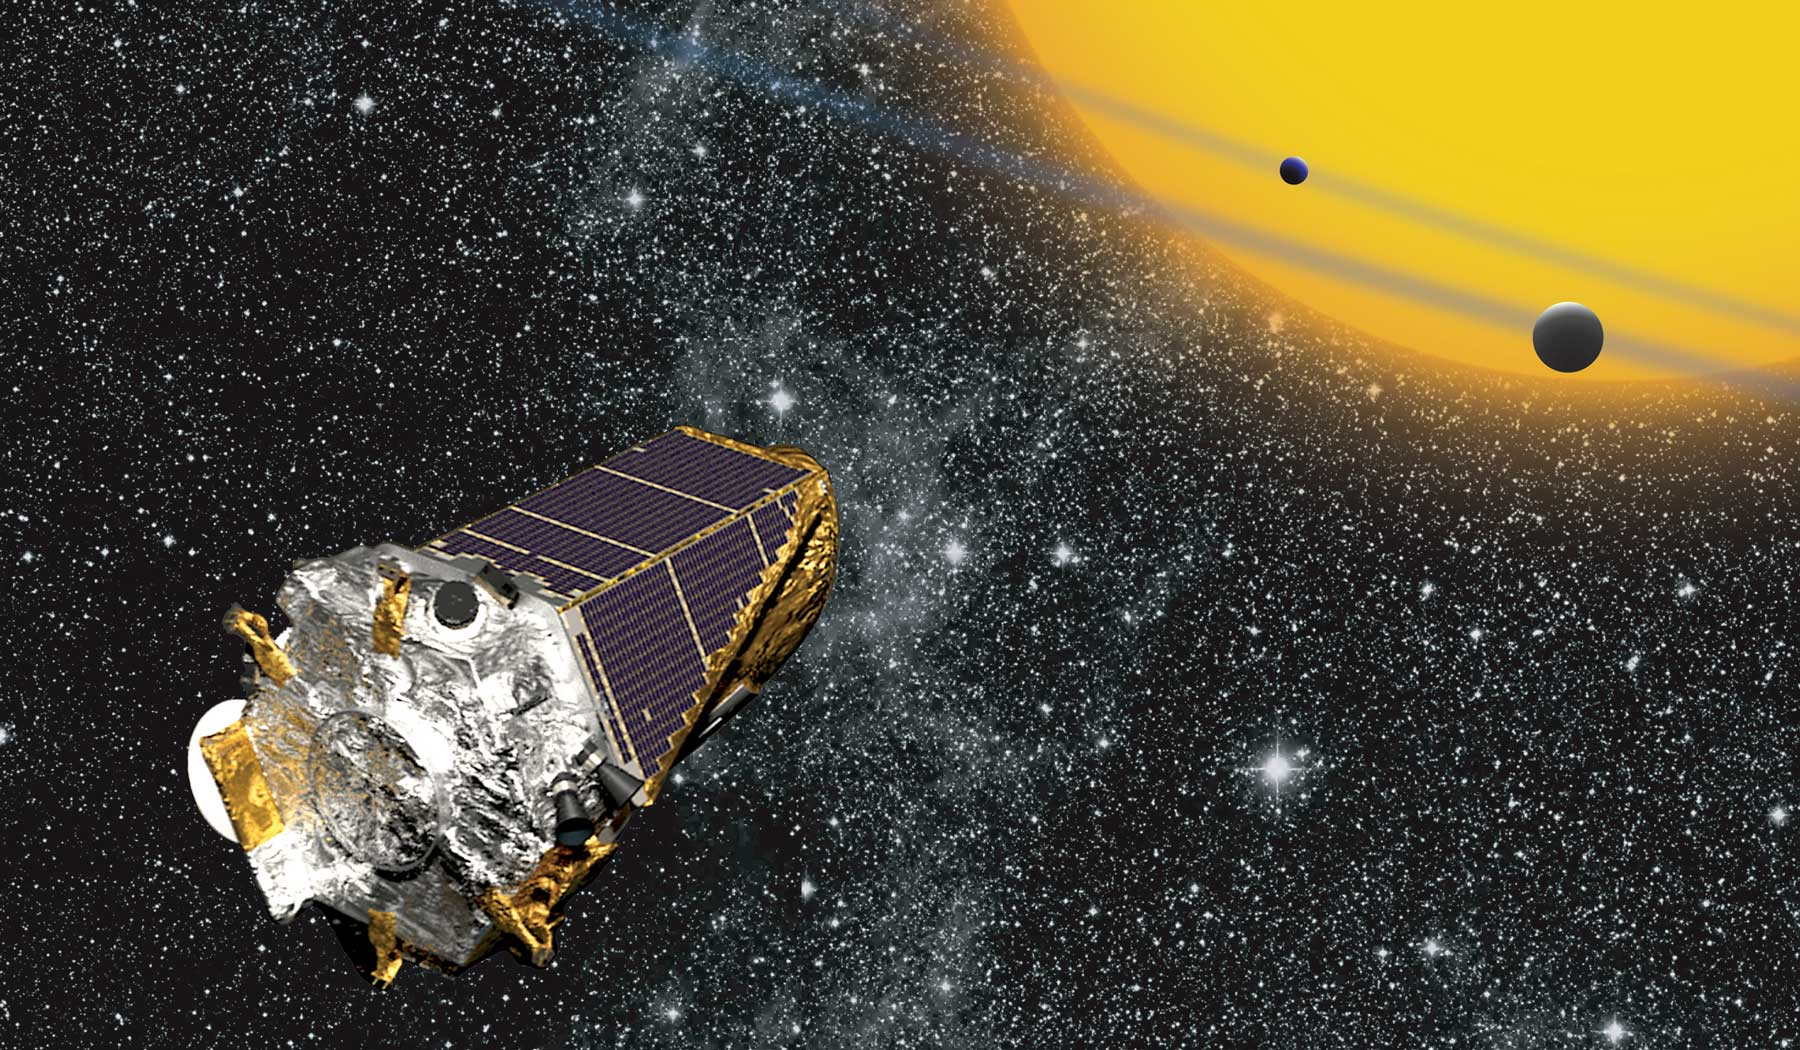 1,000 Alien Planets! NASA's Kepler Space Telescope Hits Big Milestone |  Space